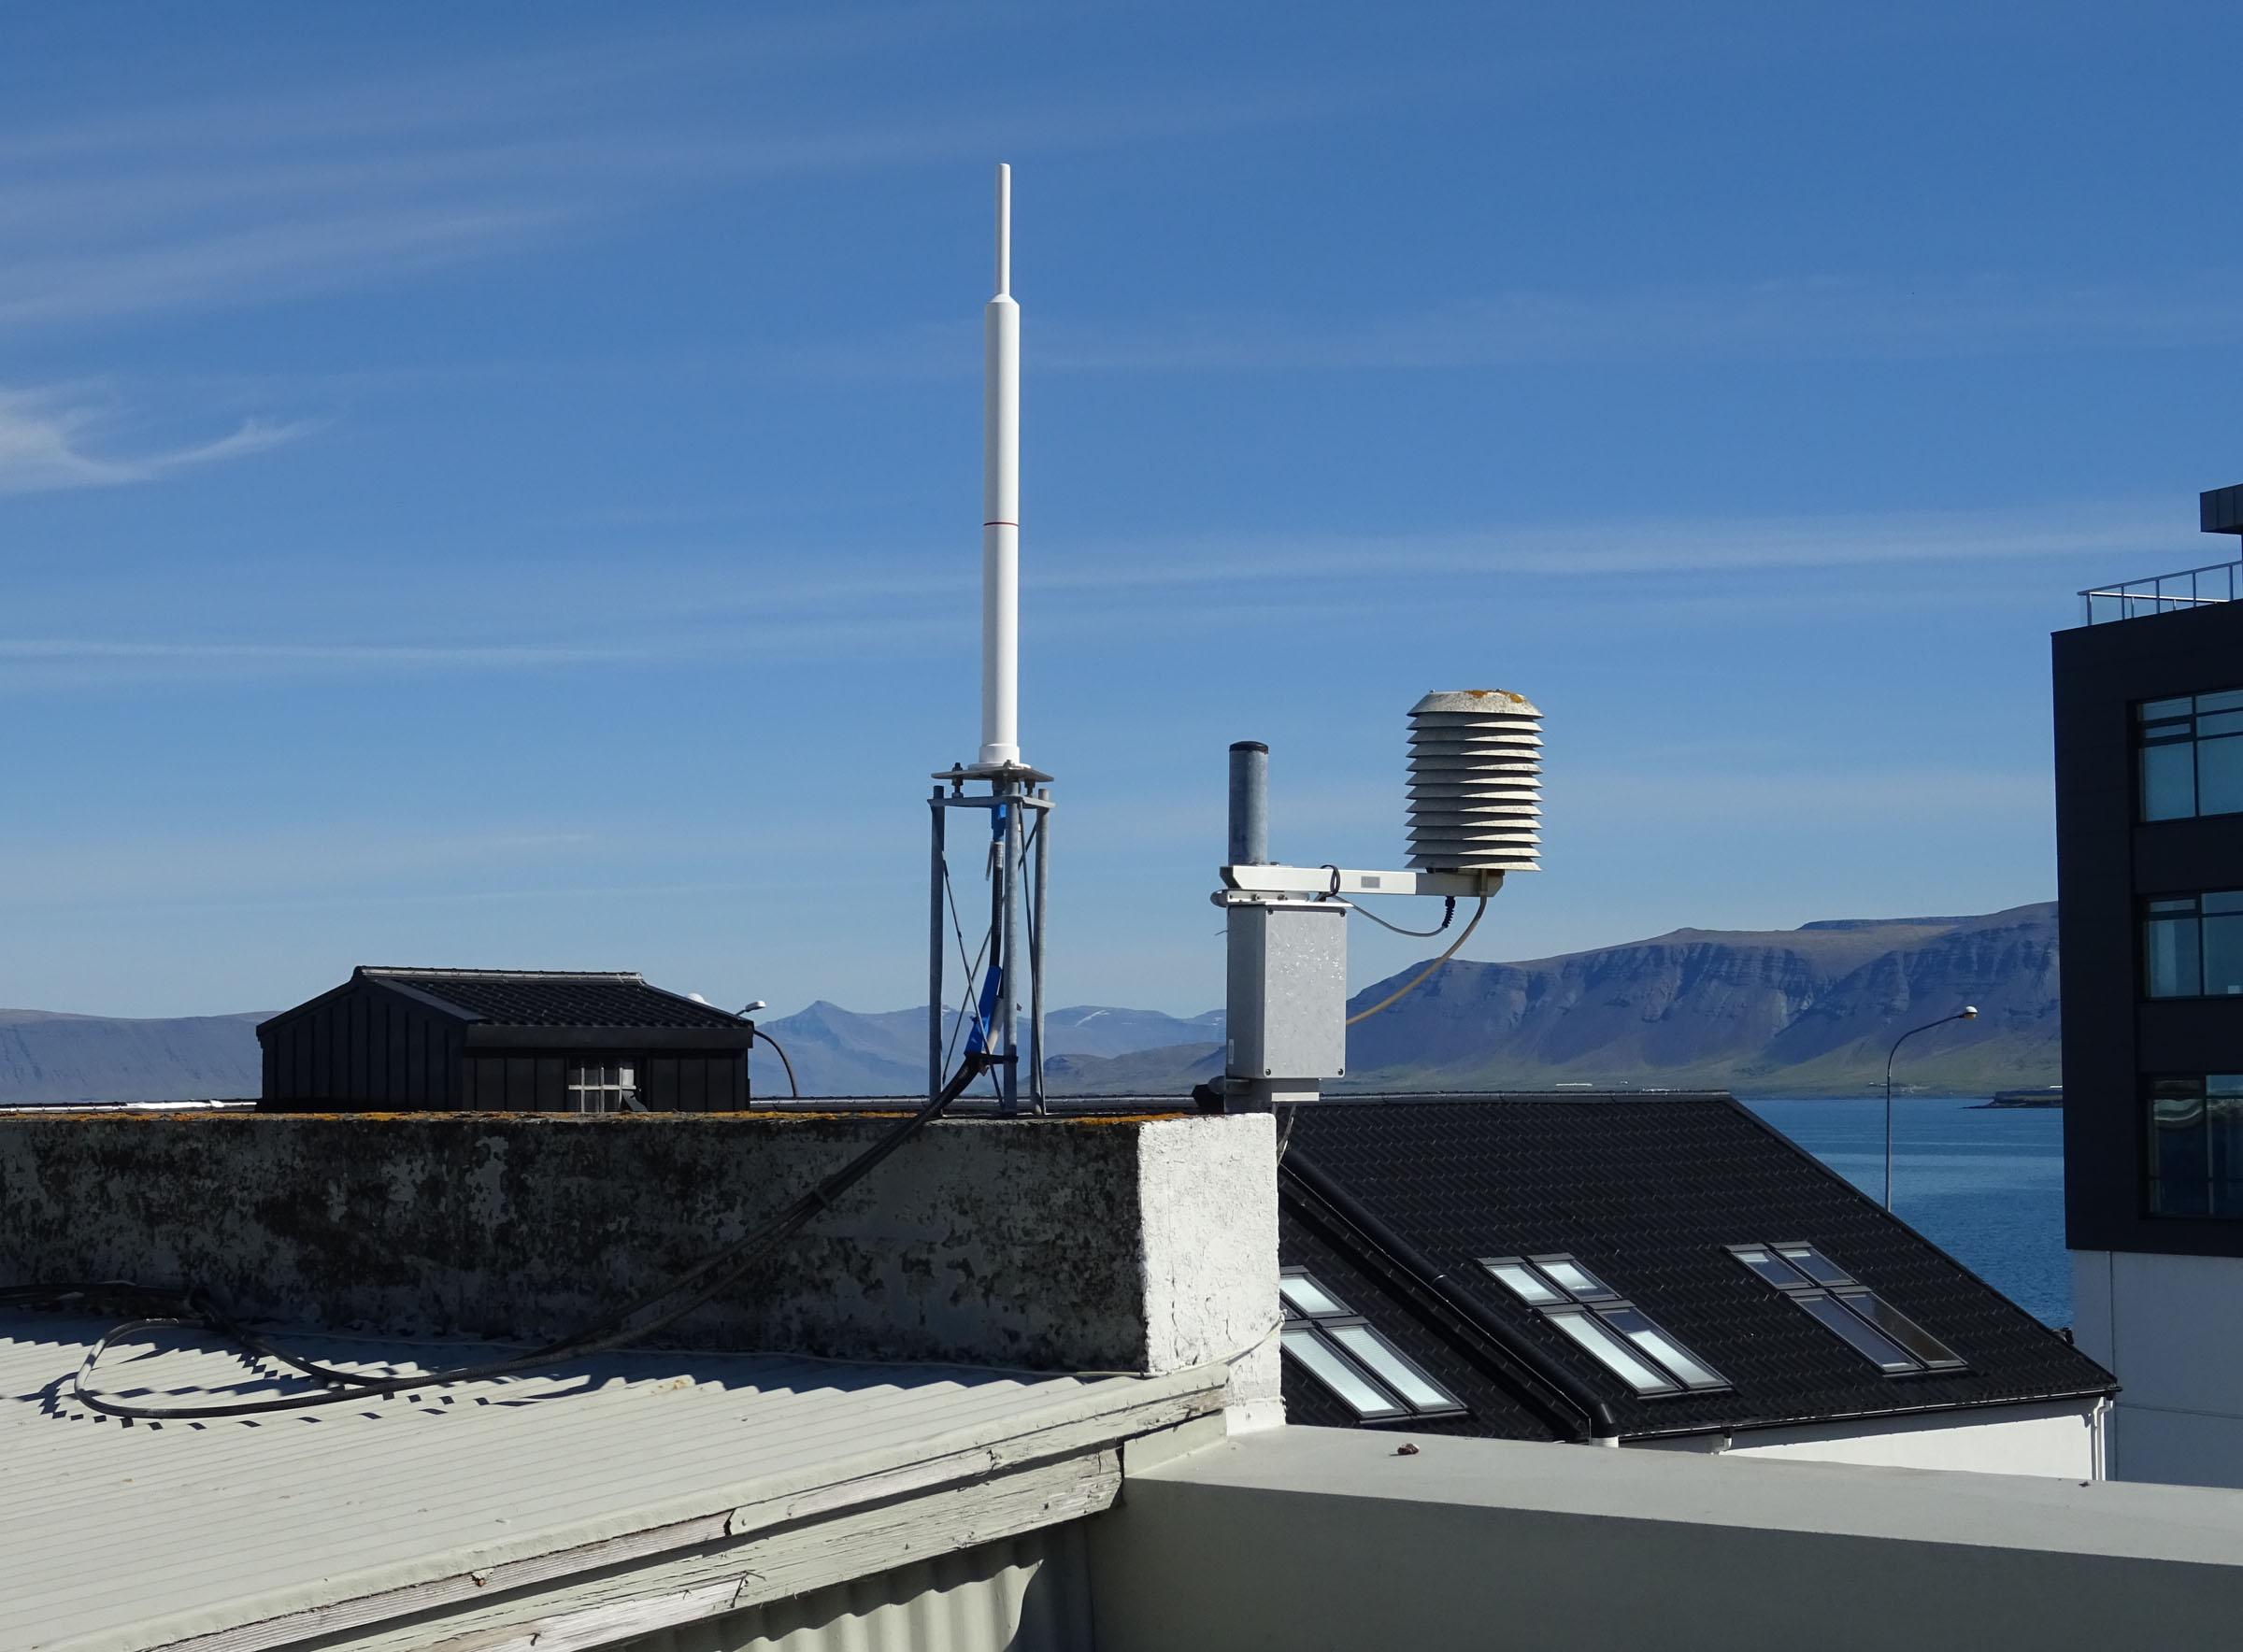 DORIS station: REYKJAVIK - ICELAND